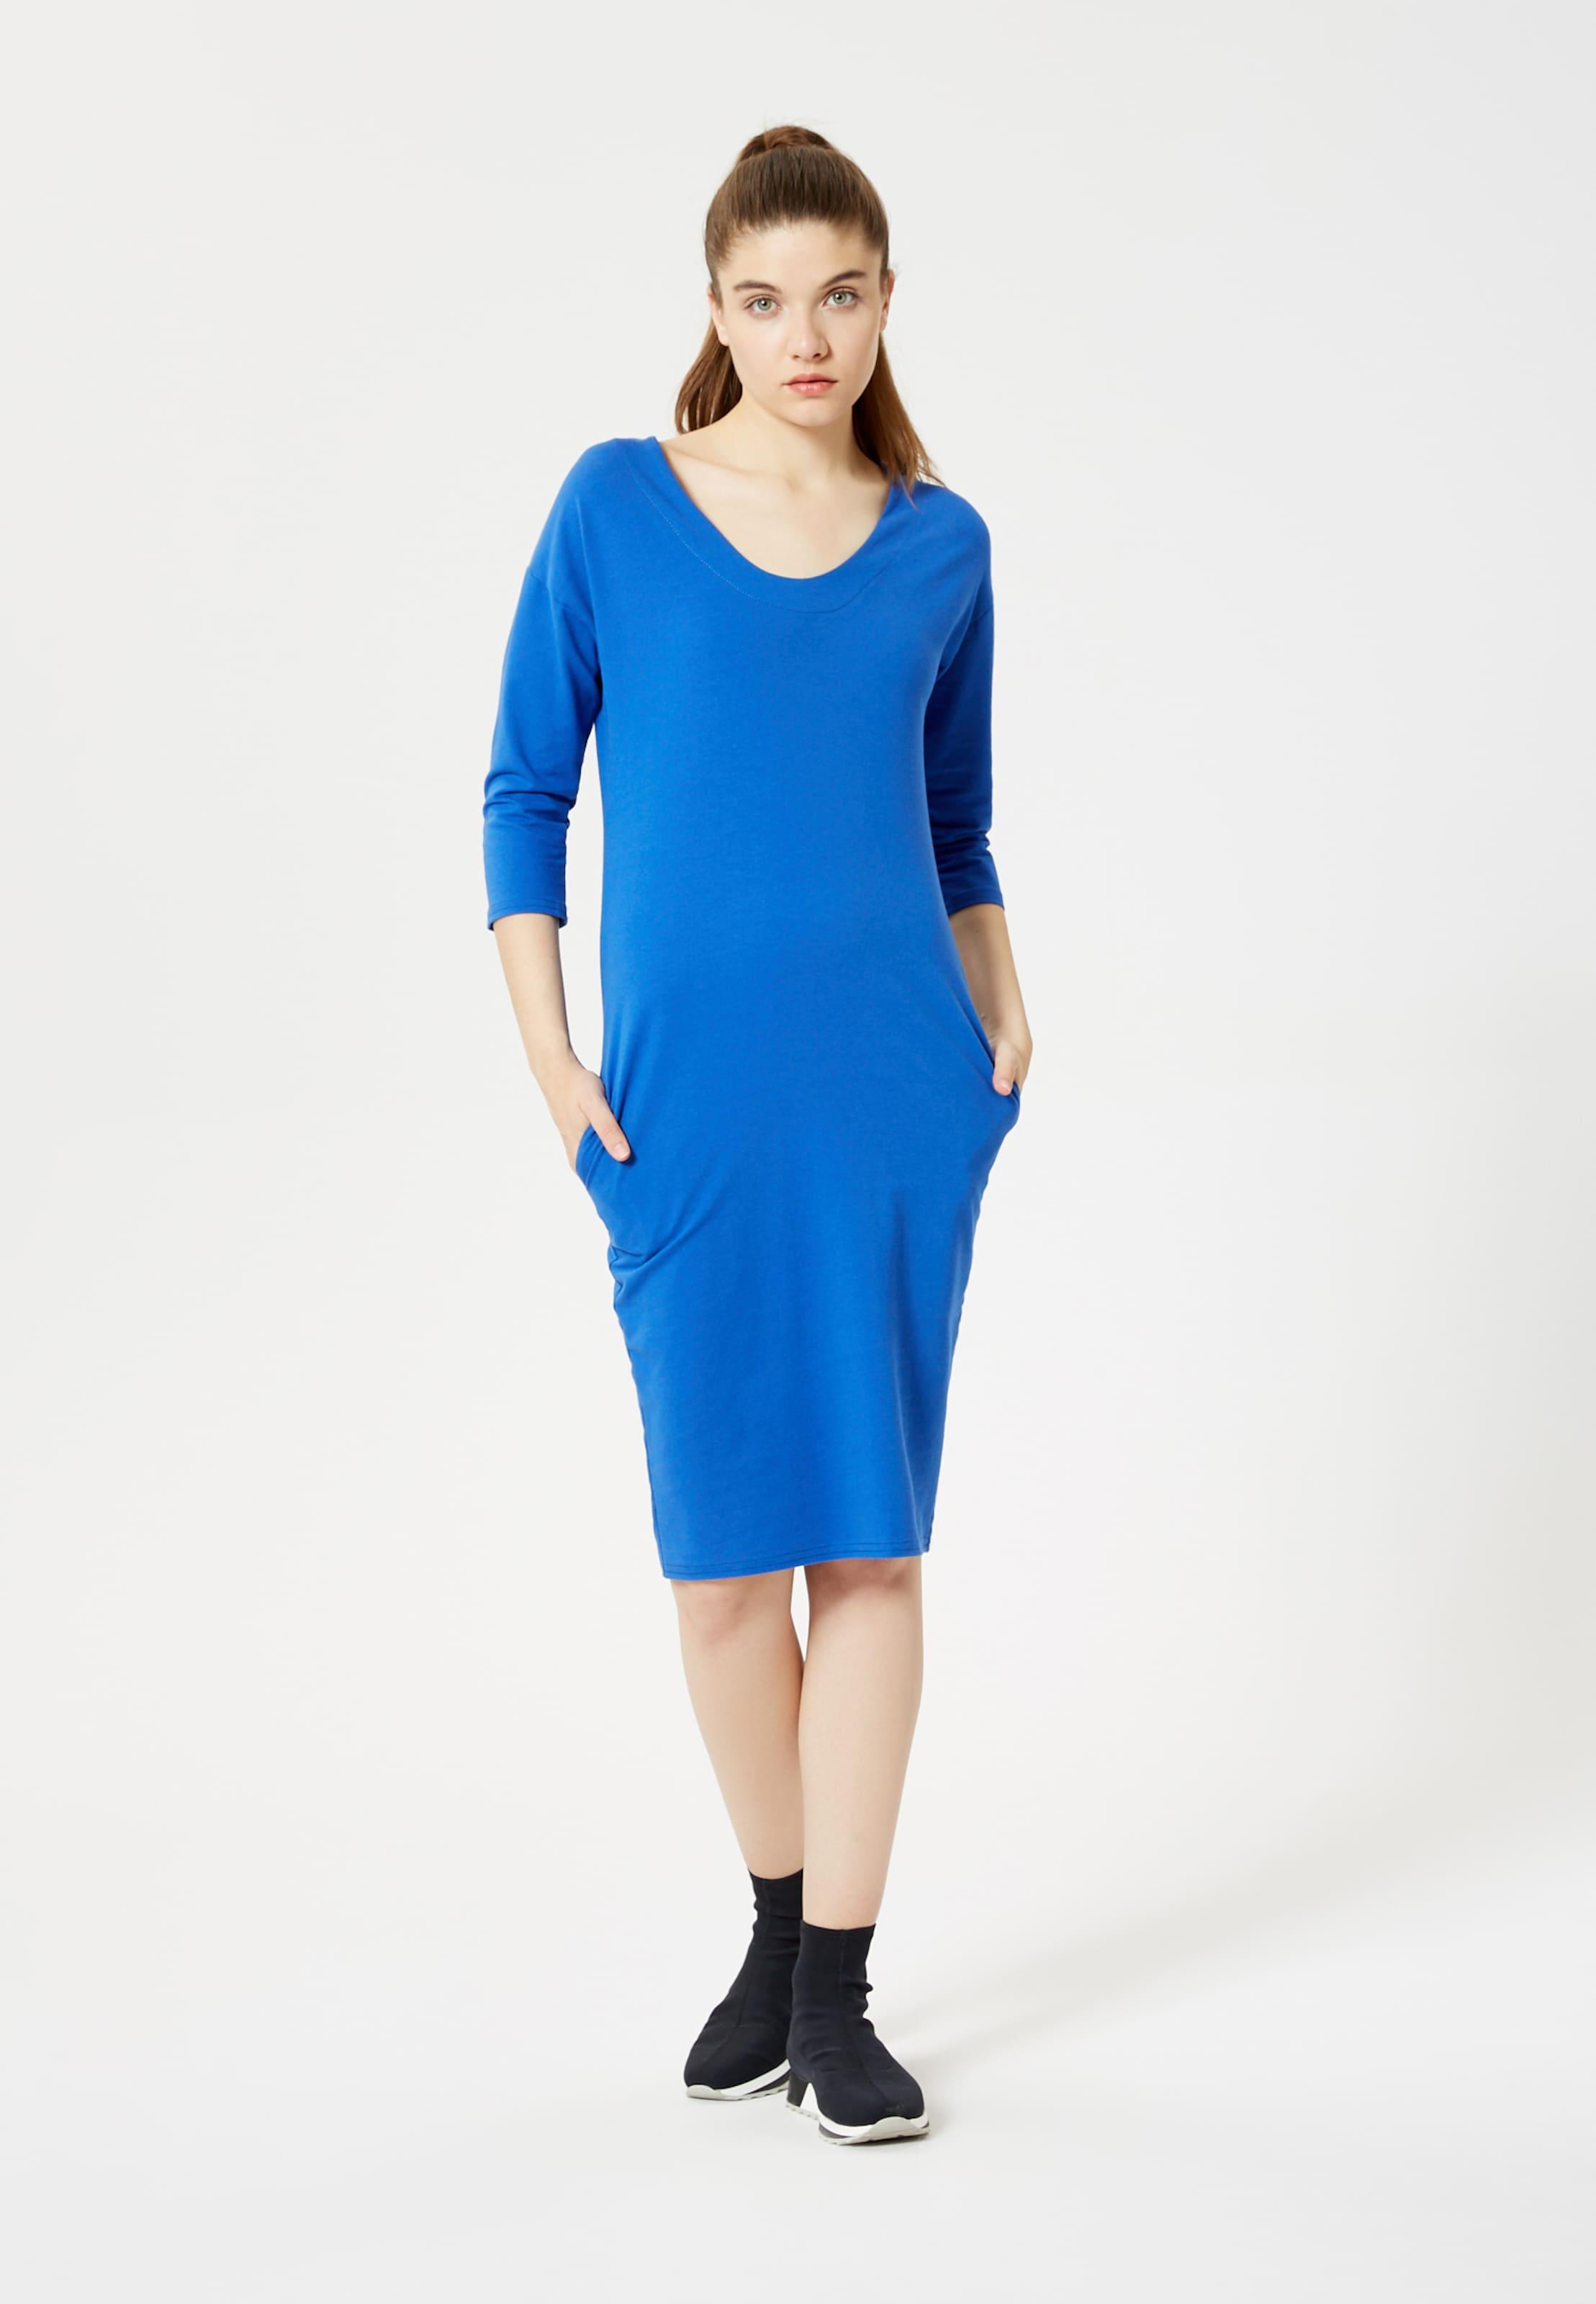 Talence Robe Robe Talence En Robe En Talence Bleu En Bleu Bleu Robe Talence En cAj3LqRS54